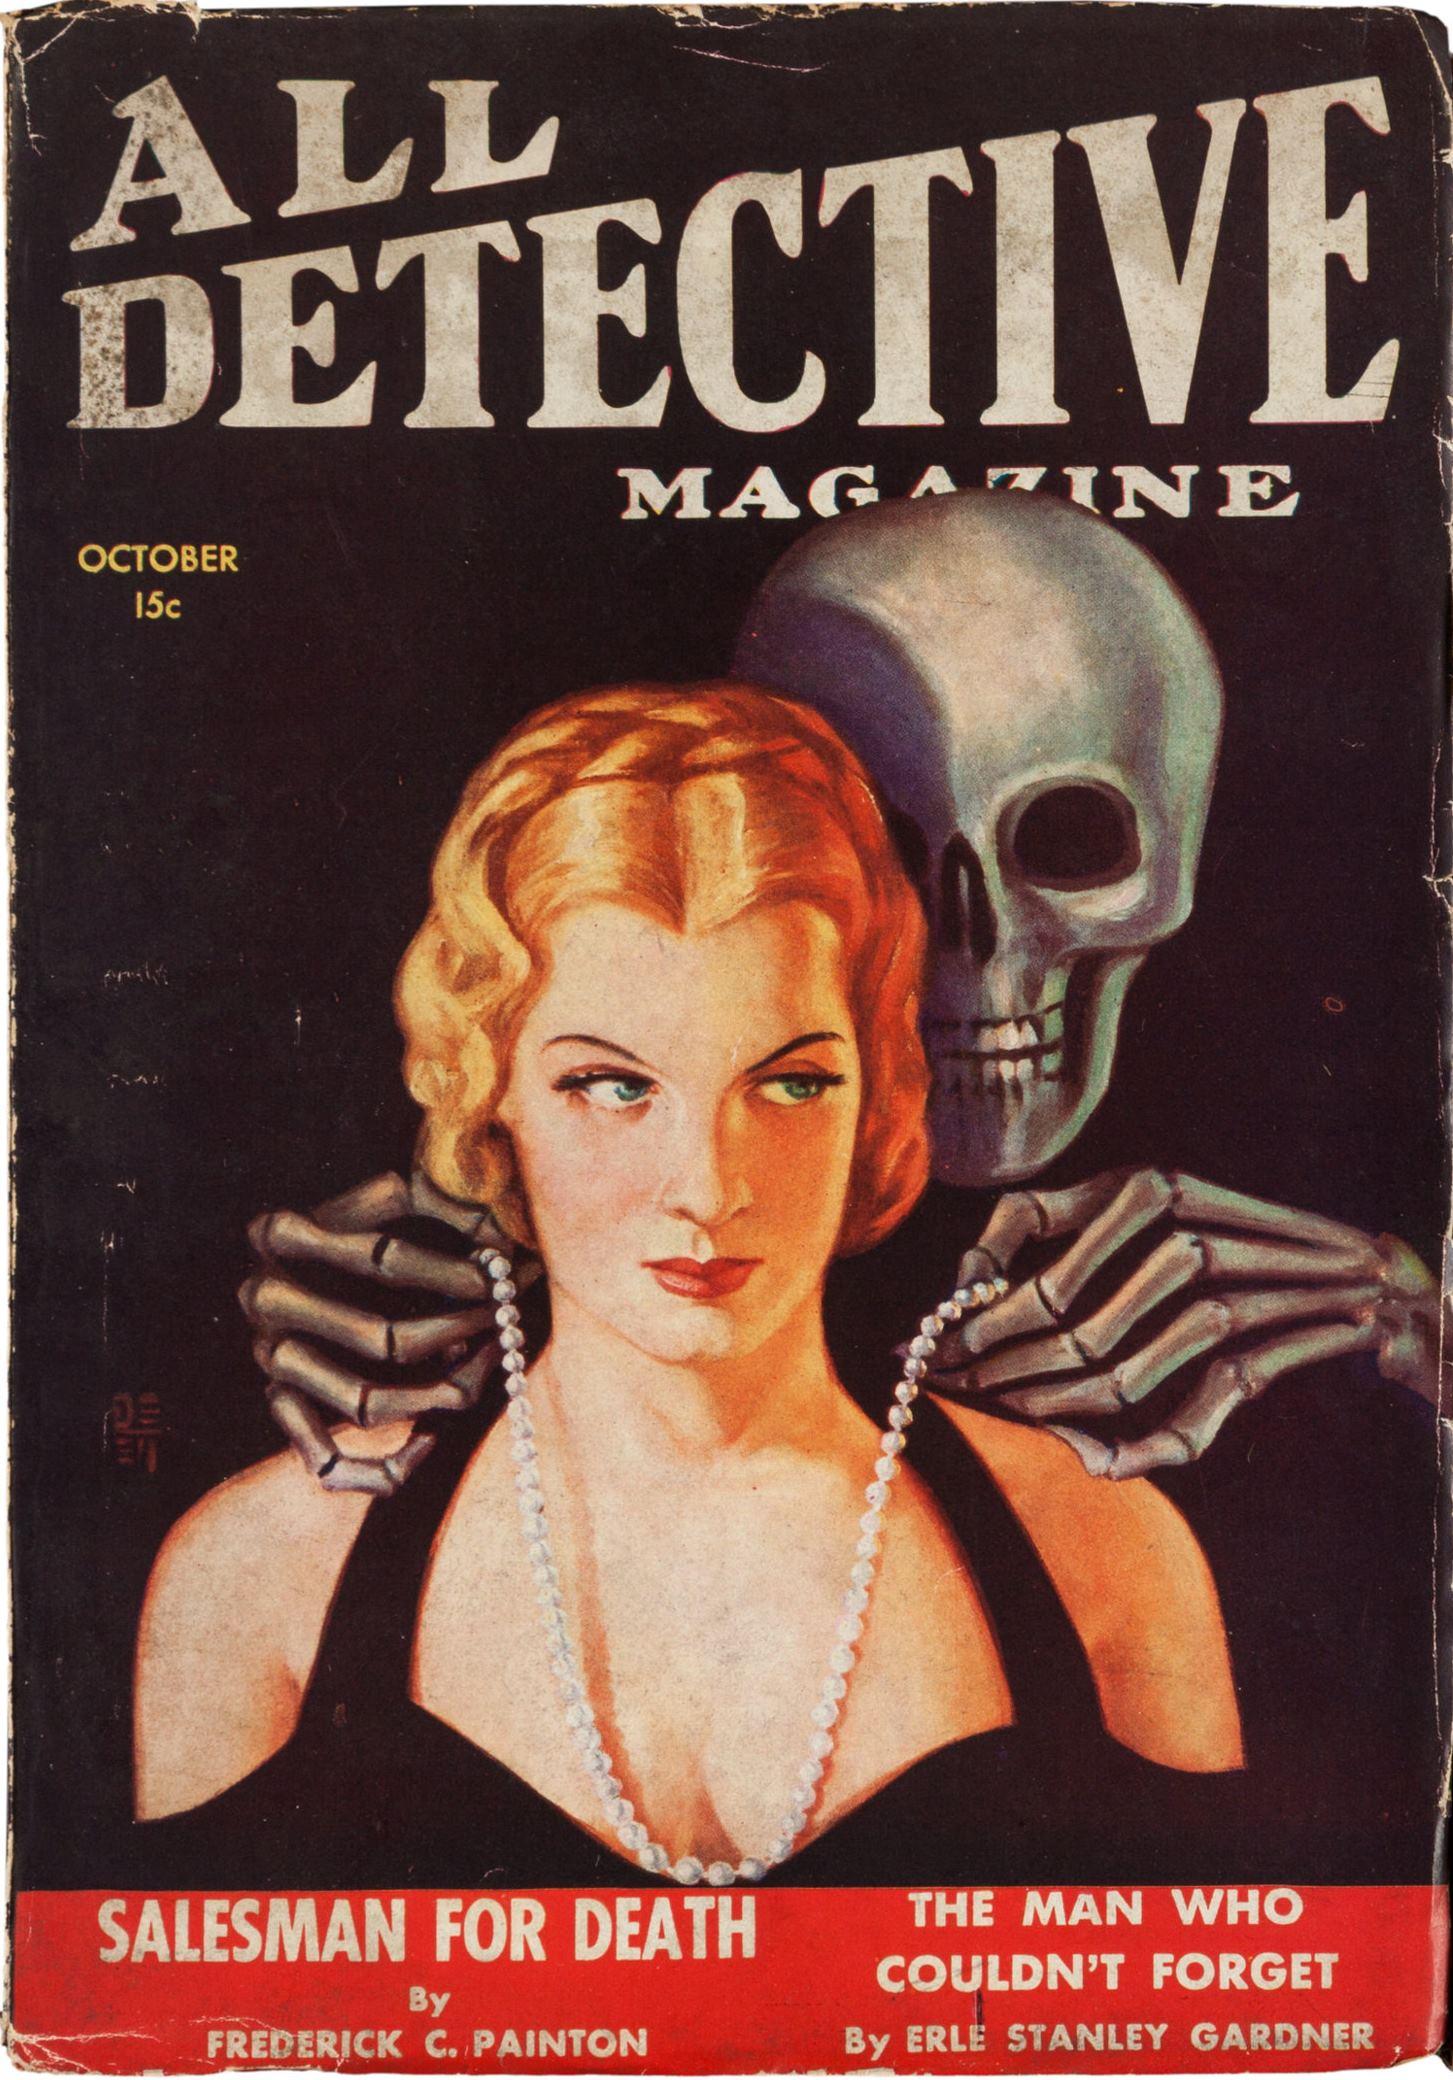 All-Detective Magazine October 1934